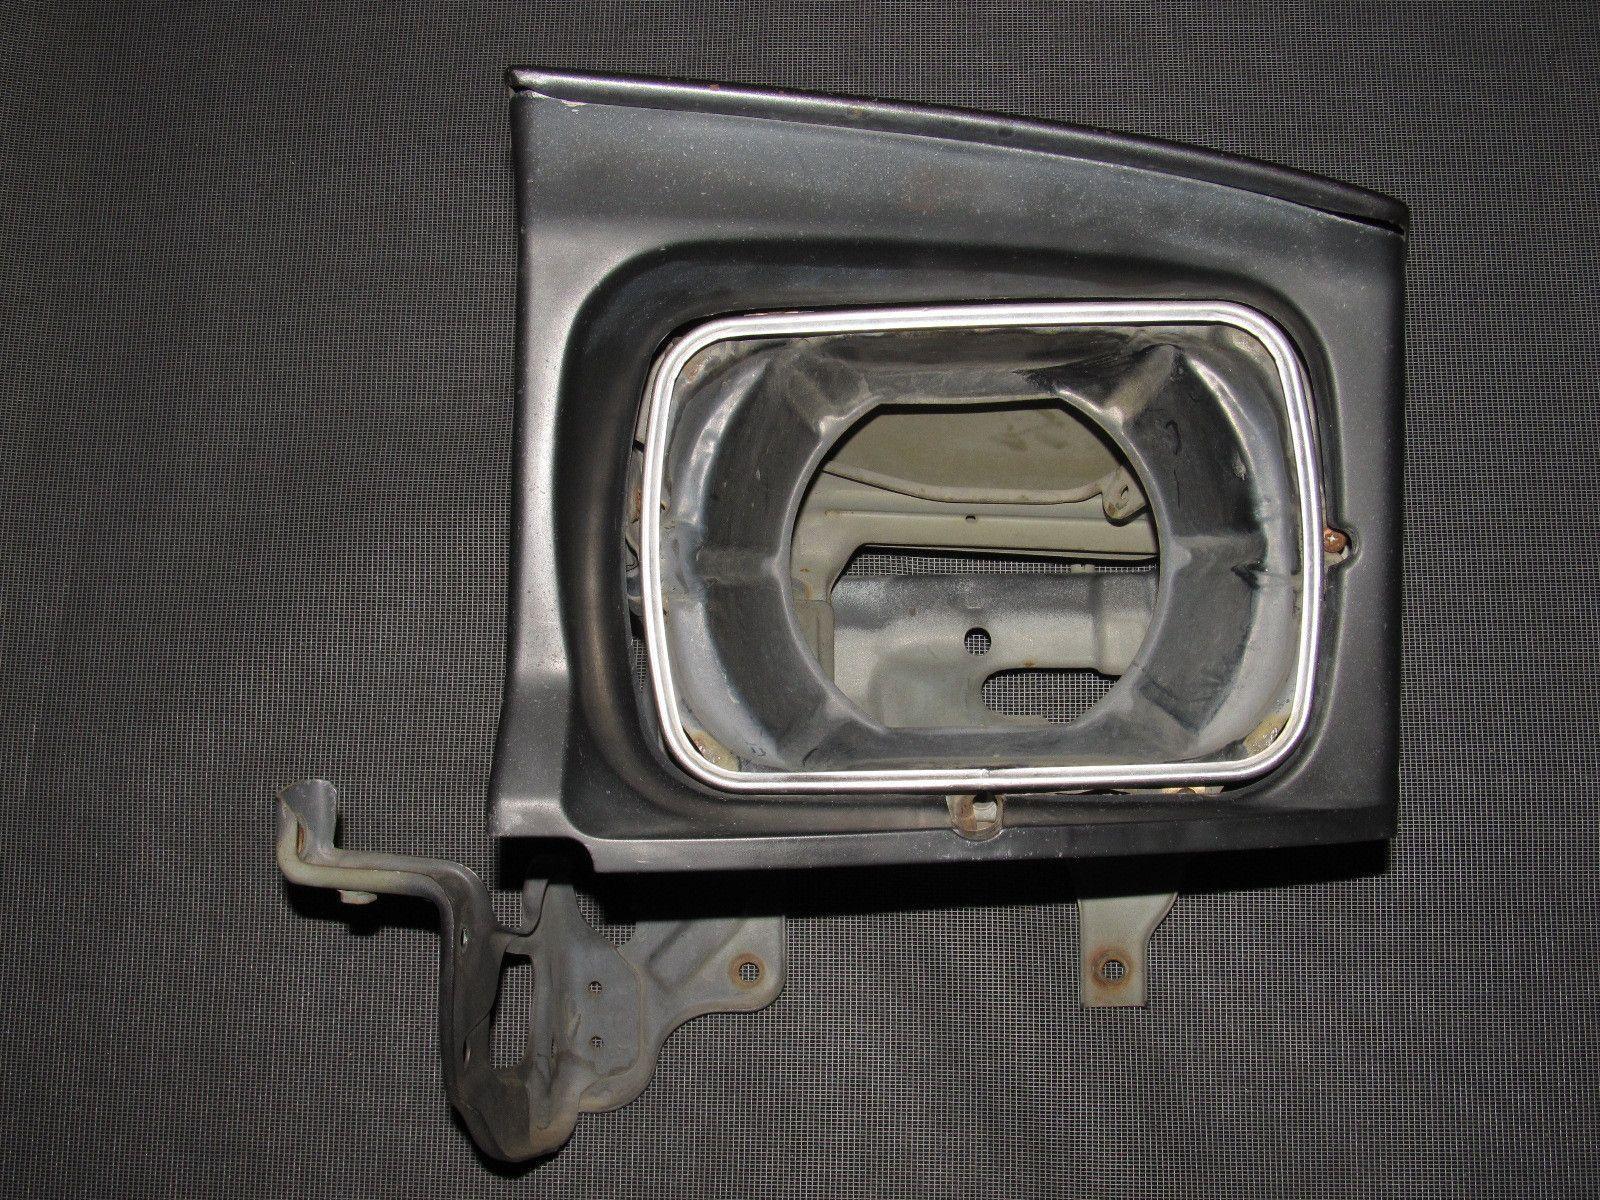 89 90 91 92 93 94 nissan 240sx oem flip headlight assembly left  89 90 91 92 93 94 nissan 240sx oem flip headlight assembly left